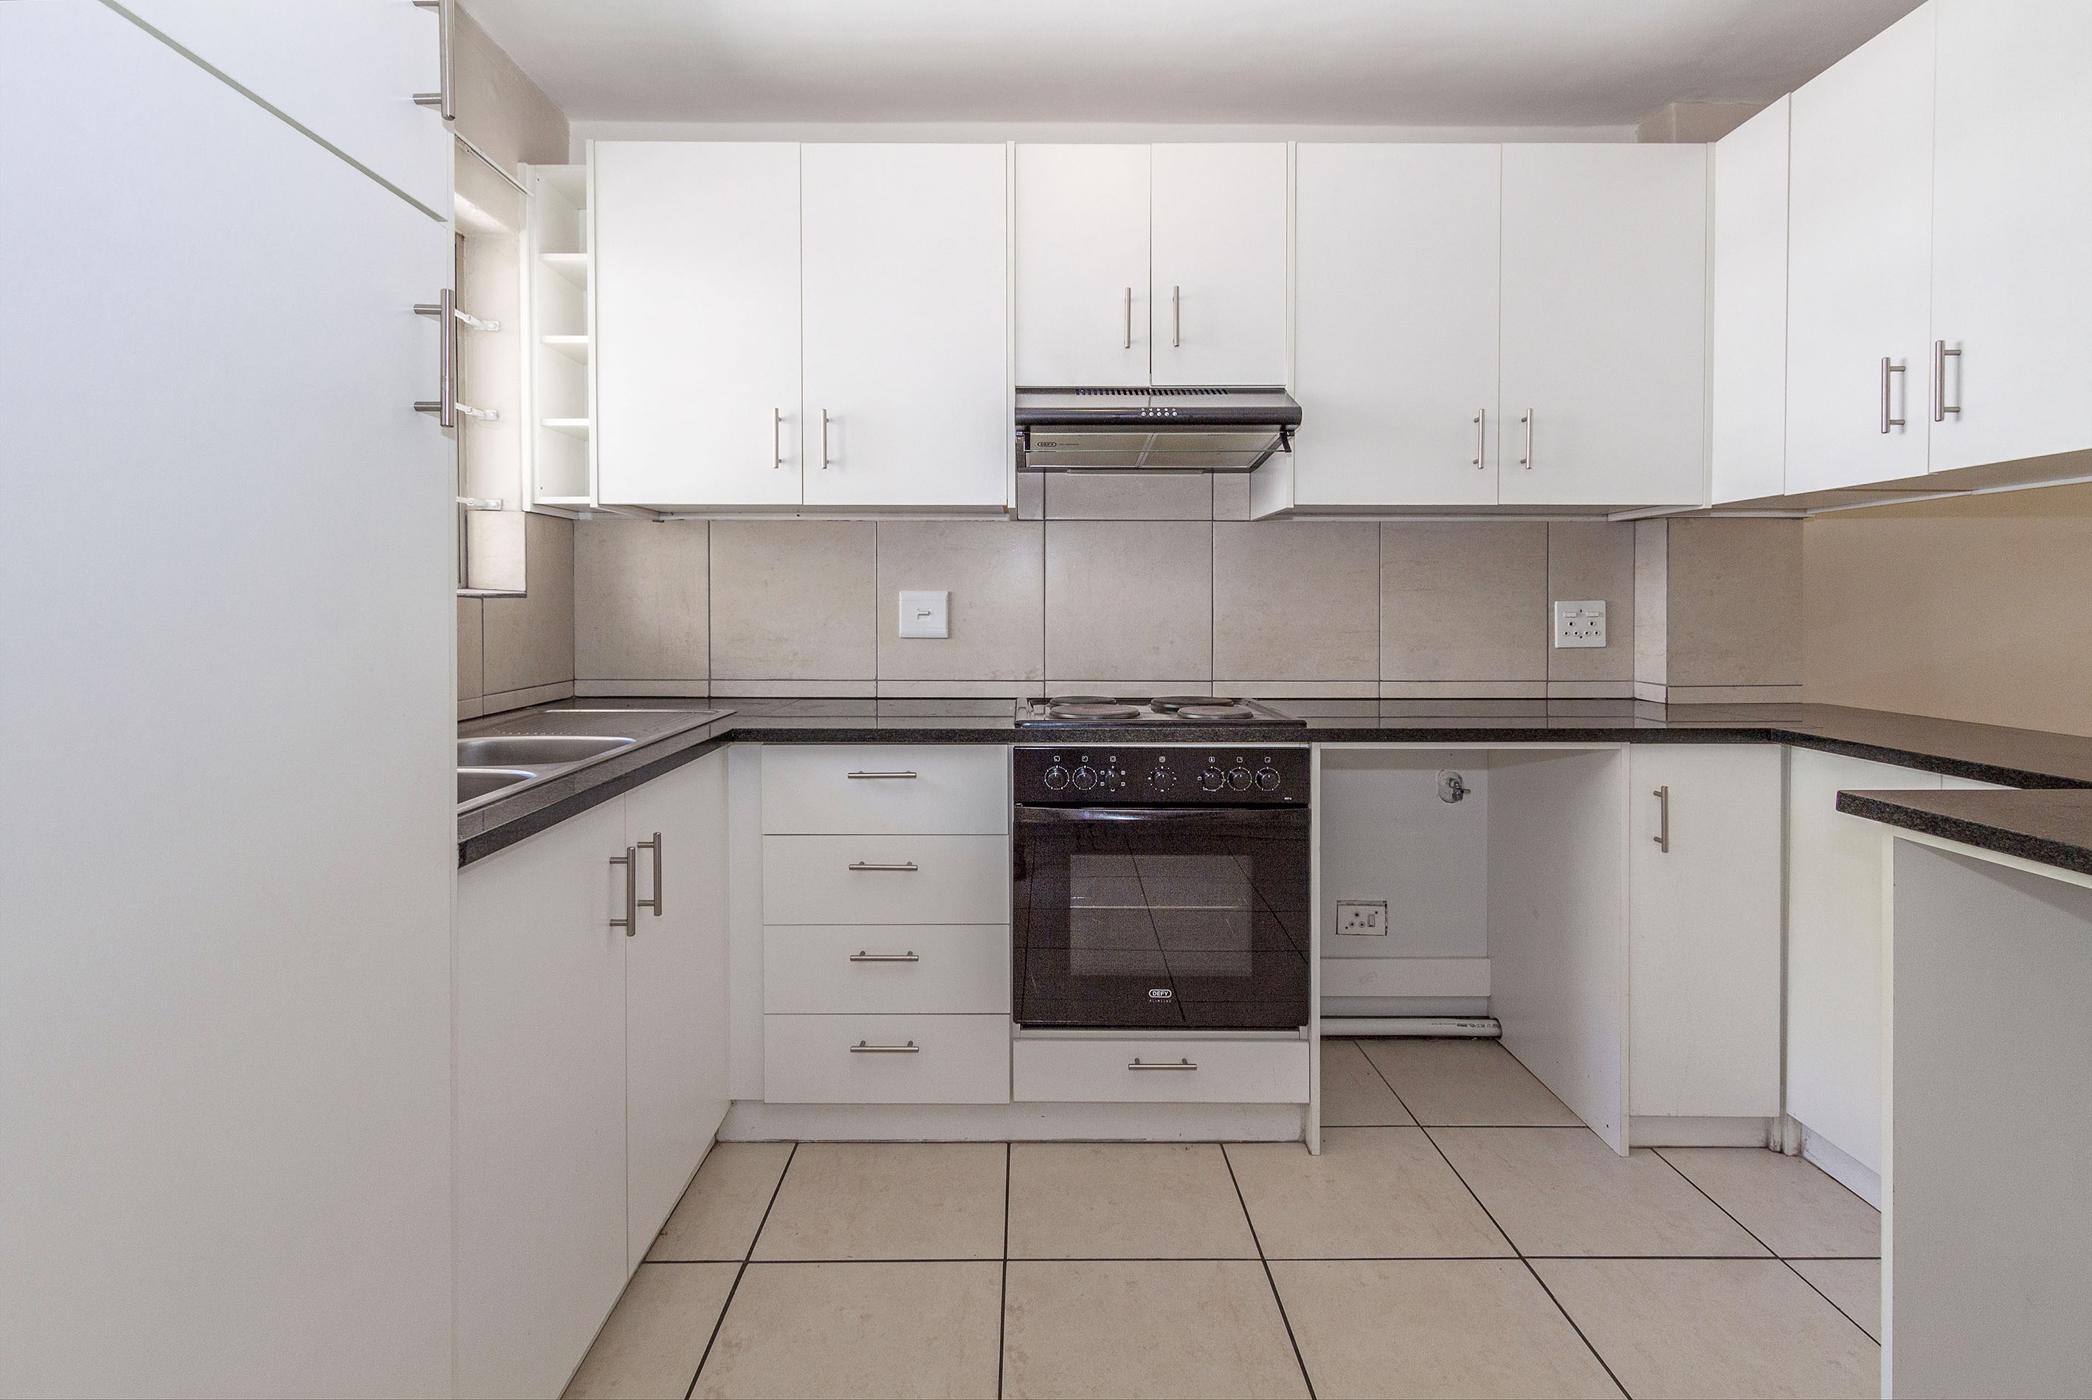 3 bedroom apartment for sale in Stellenbosch Central